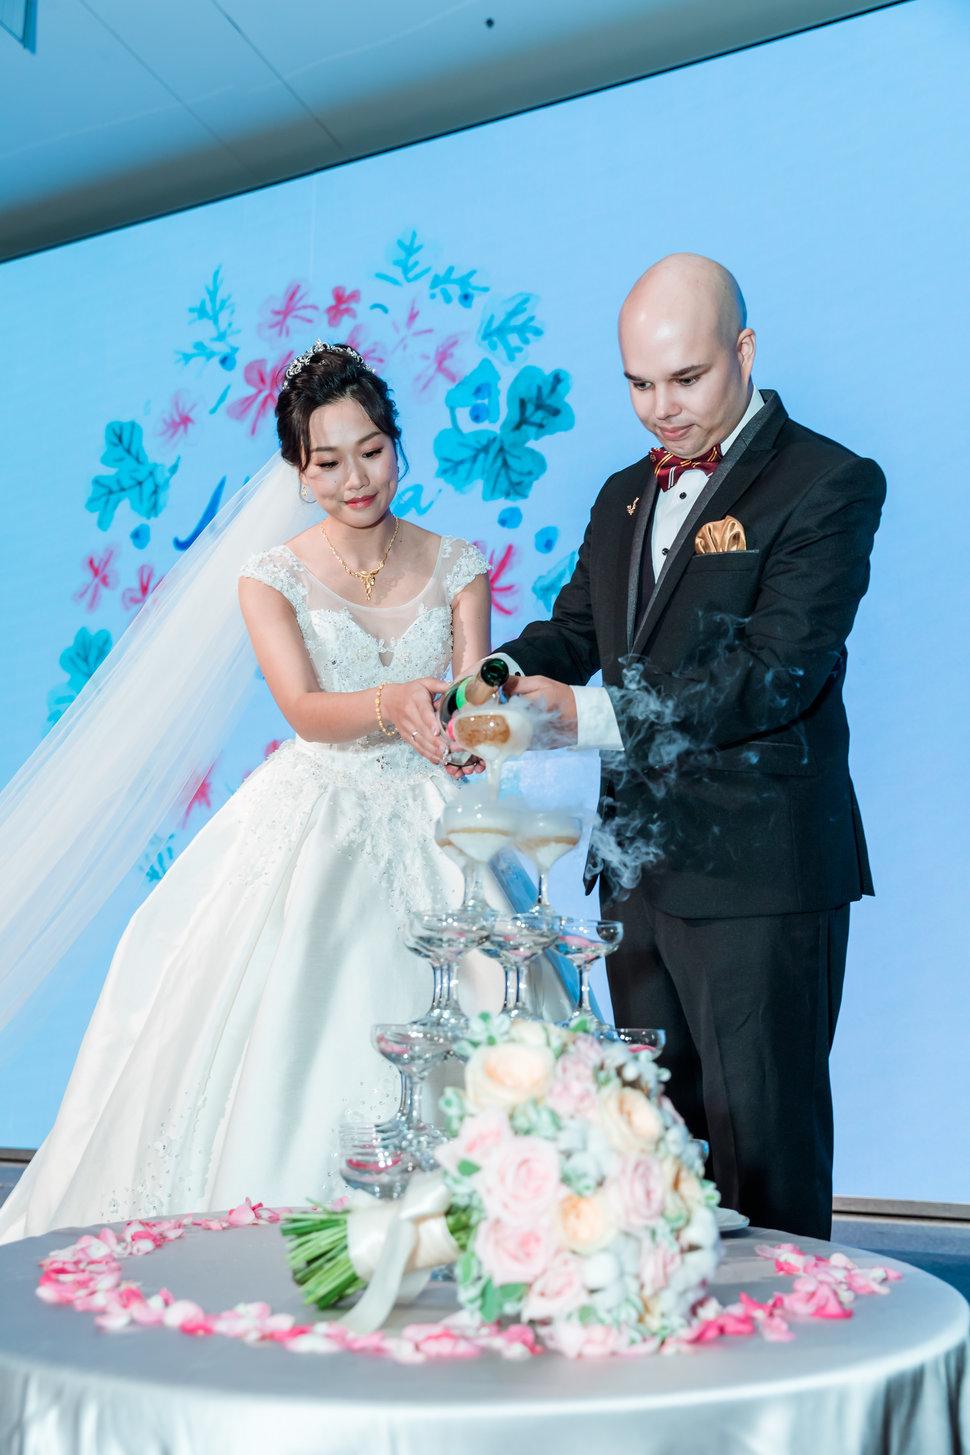 5D4_0517 - Promaker婚禮紀錄攝影團隊婚攝豪哥《結婚吧》